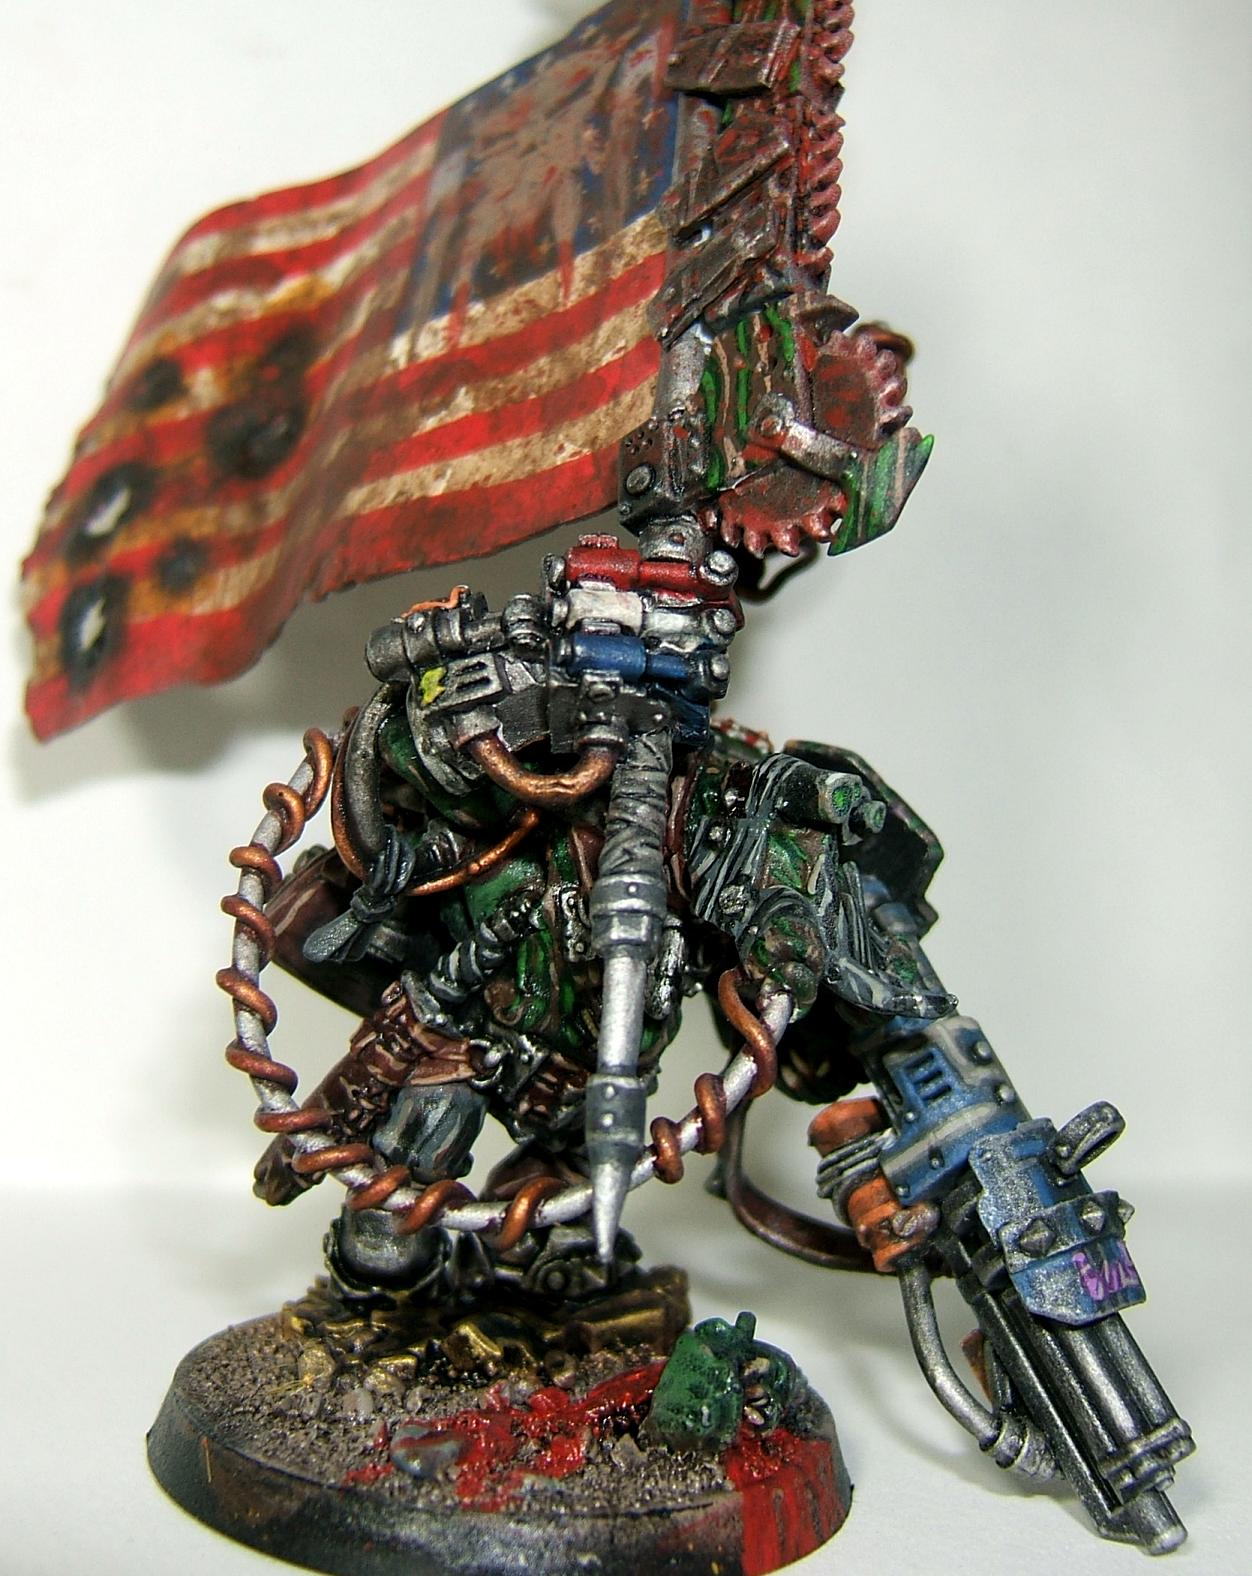 America, Blood Axe, Bludd Axe, Conversion, Flag, Kommando, Kommandoz, Orks, Space Ork, Space Orks, Waaagh!, Warboss, Warhammer 40,000, Warhammer Fantasy